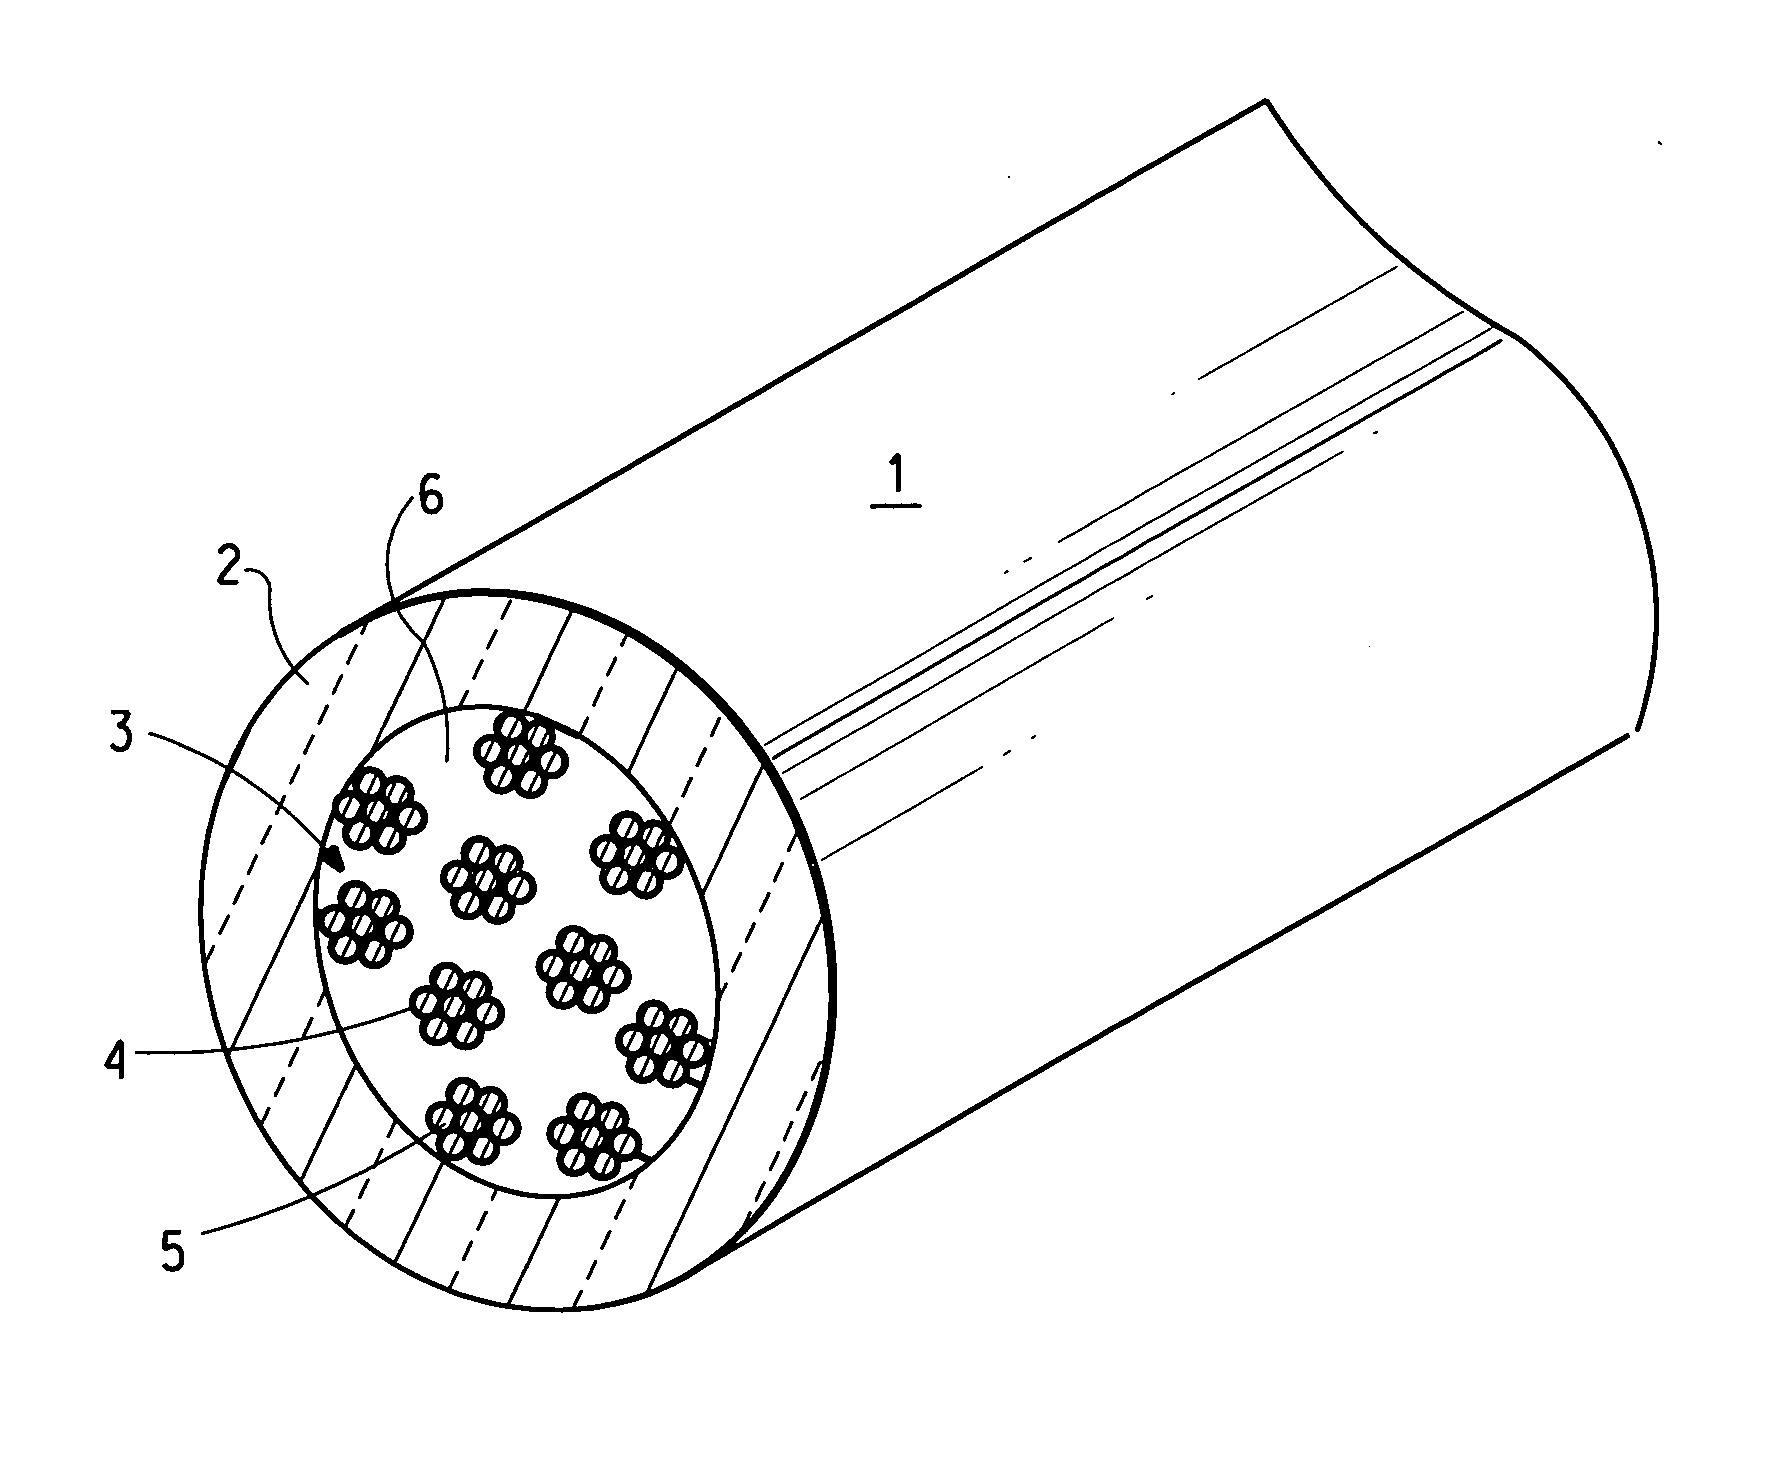 light switch wiring diagram 2 gang auto electrical wiring diagram  related with light switch wiring diagram 2 gang